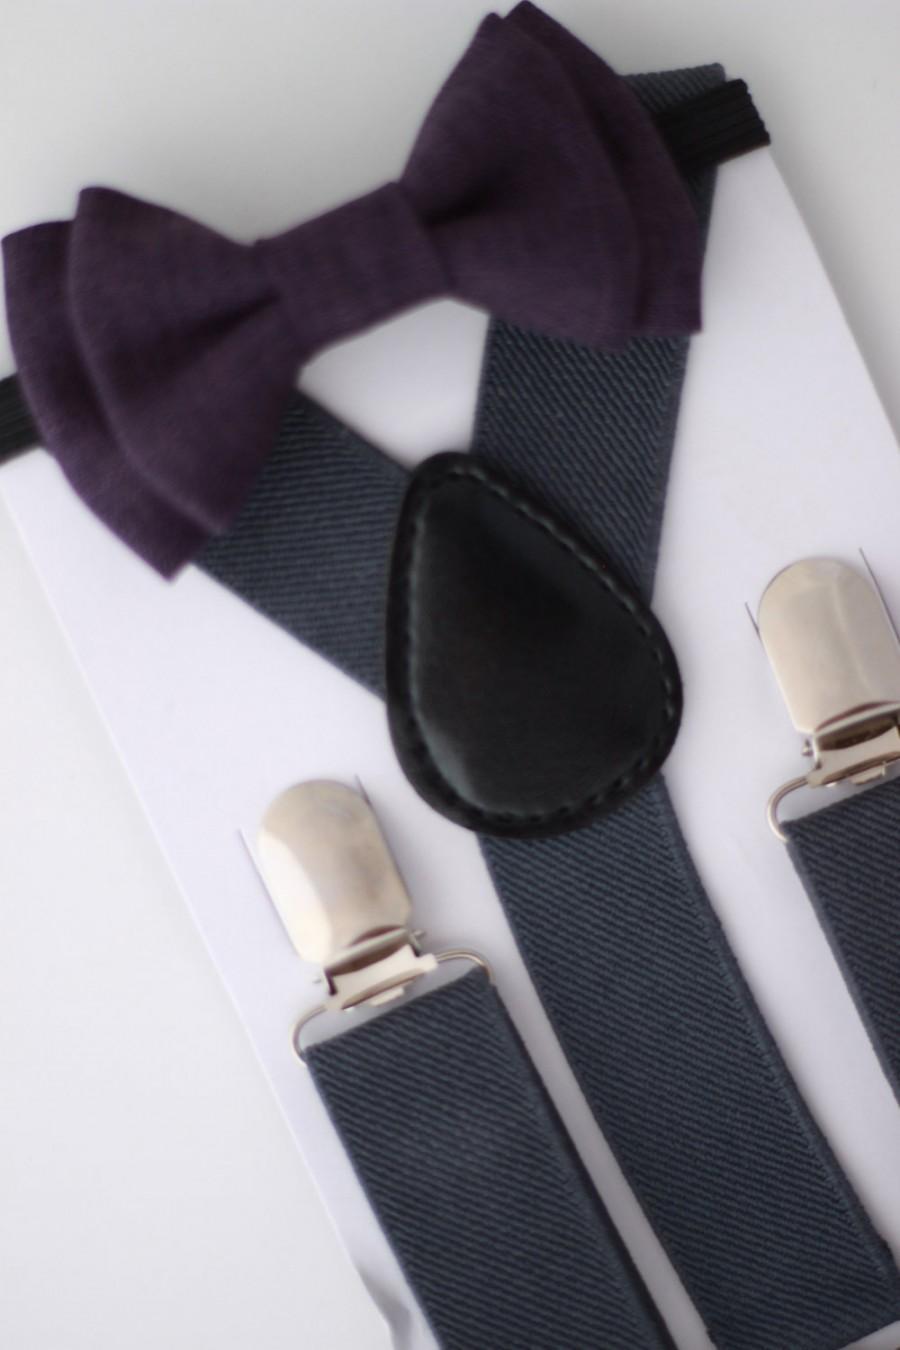 زفاف - SUSPENDER & BOWTIE SET.  Newborn - Adult sizes. Dark grey suspenders. Dark purple chambray bow tie.